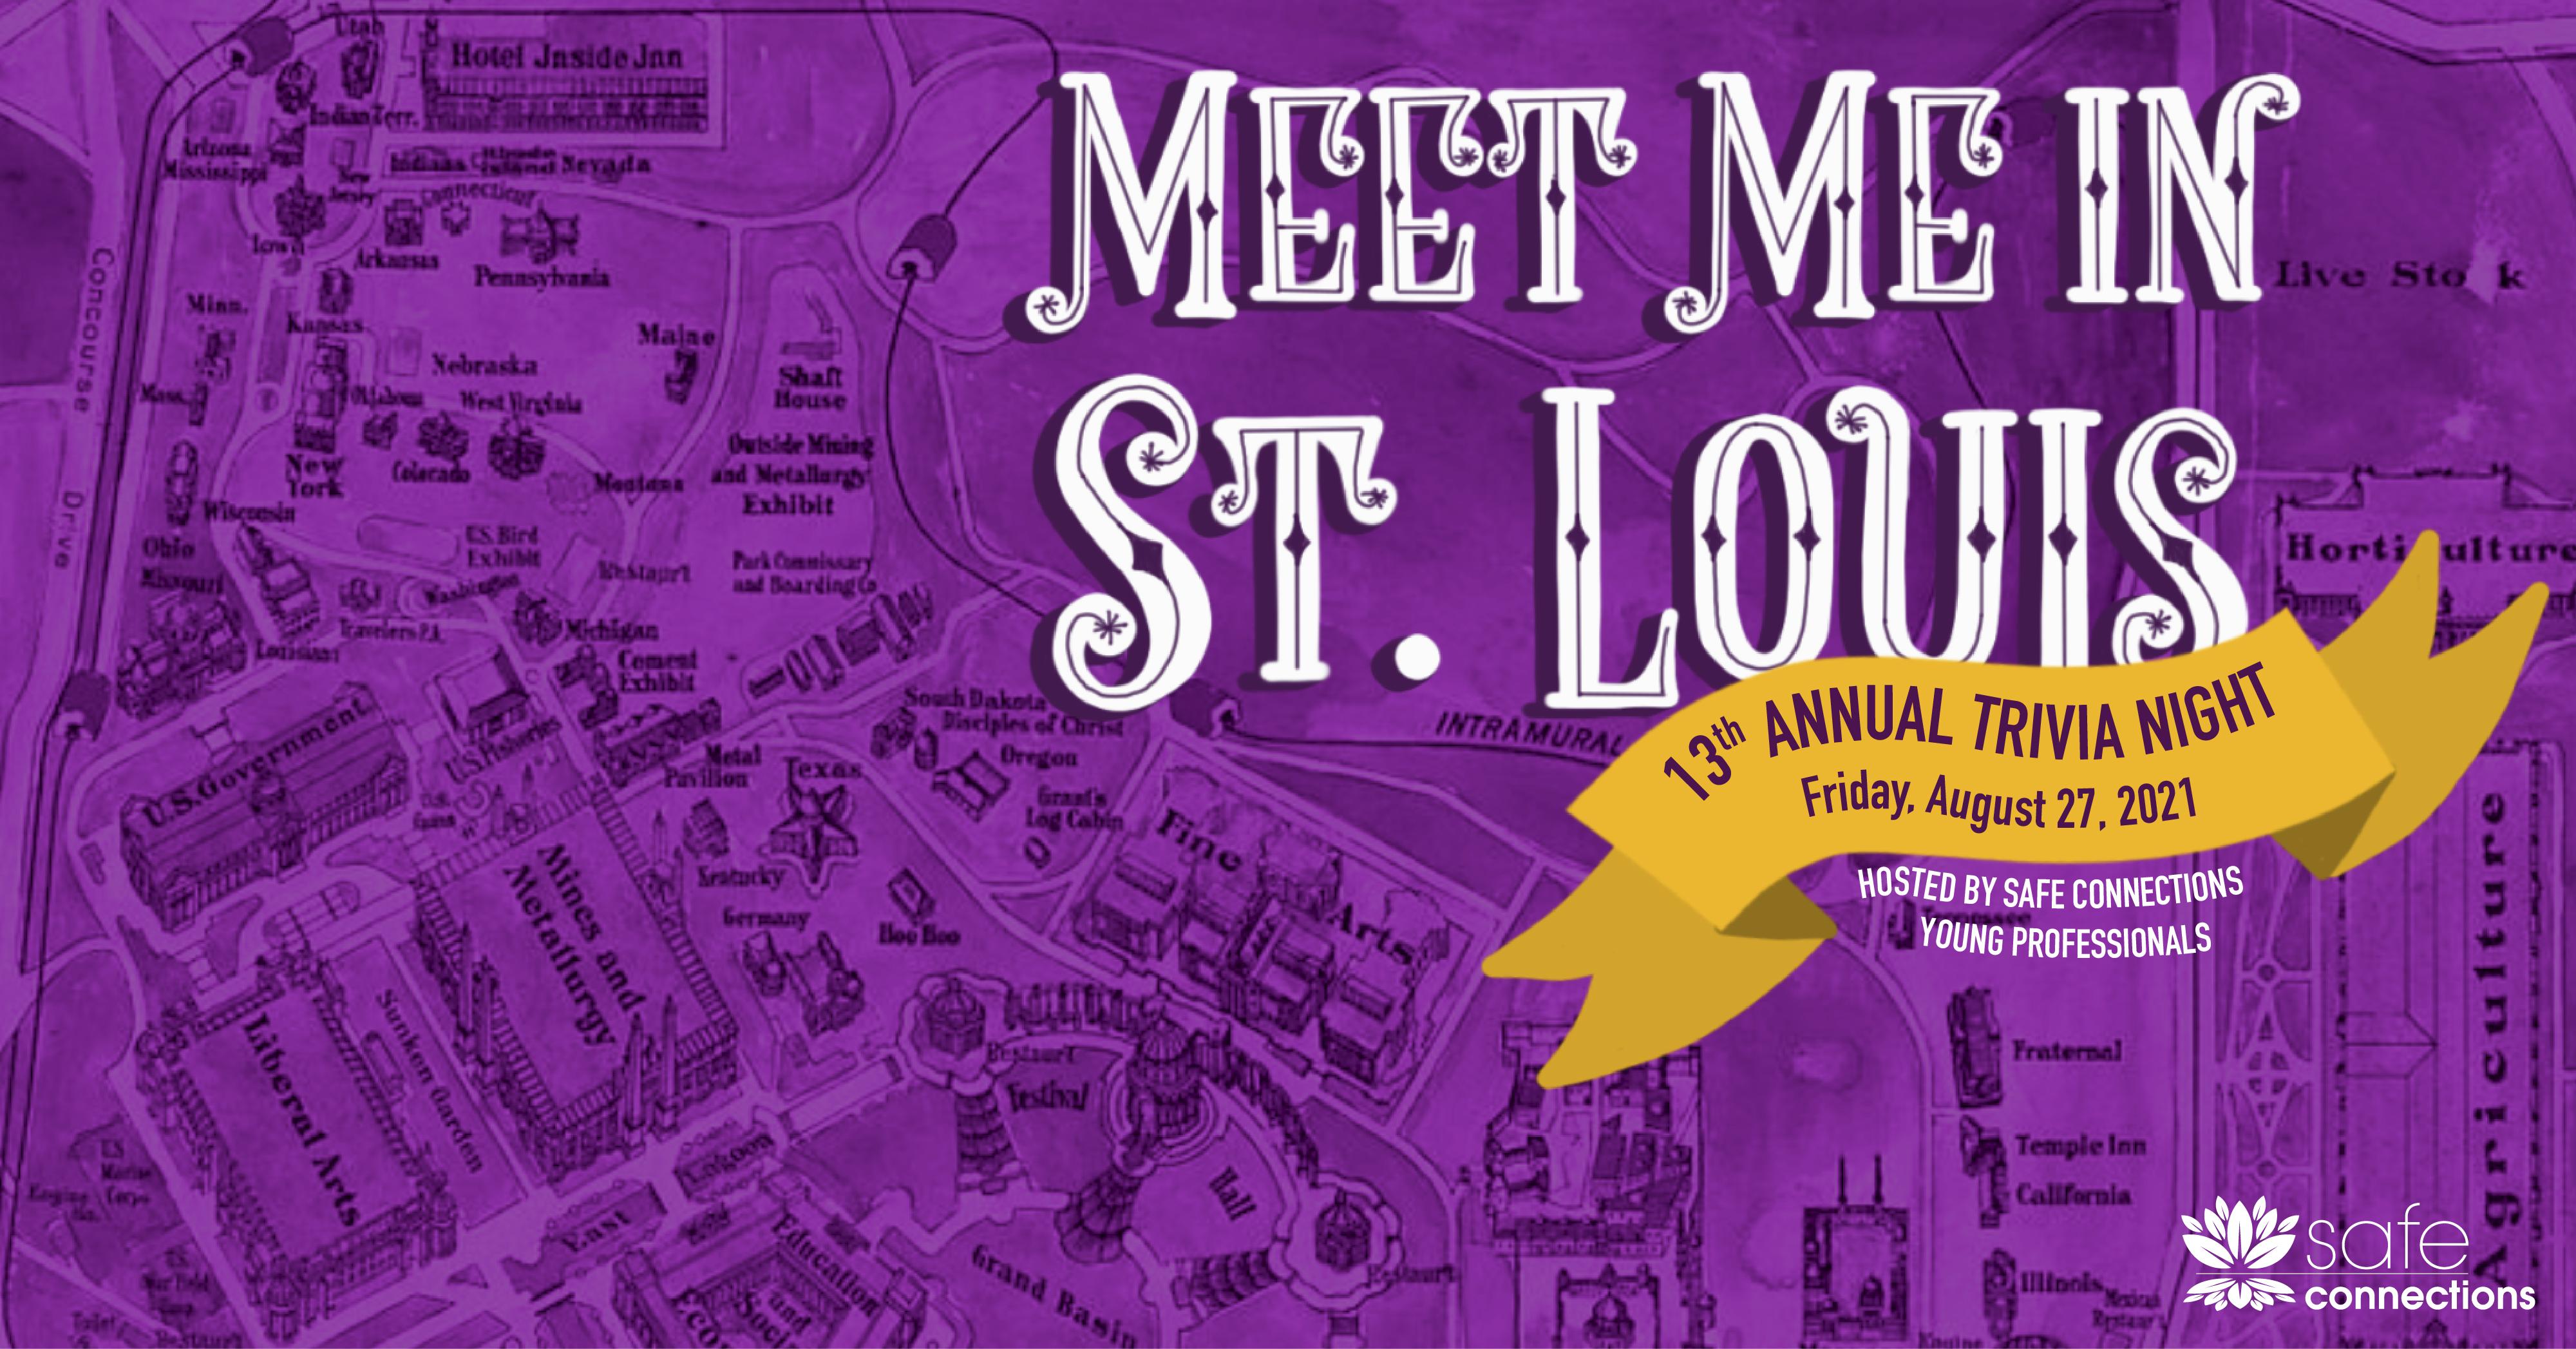 Trivia Night – Meet Me In St. Louis